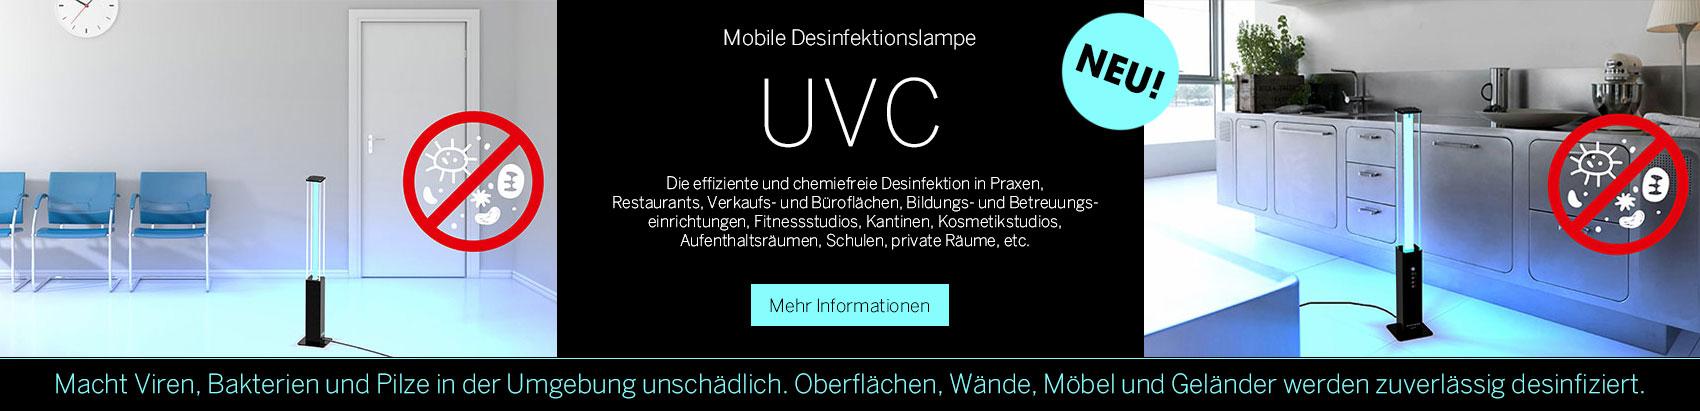 Banner - UVC